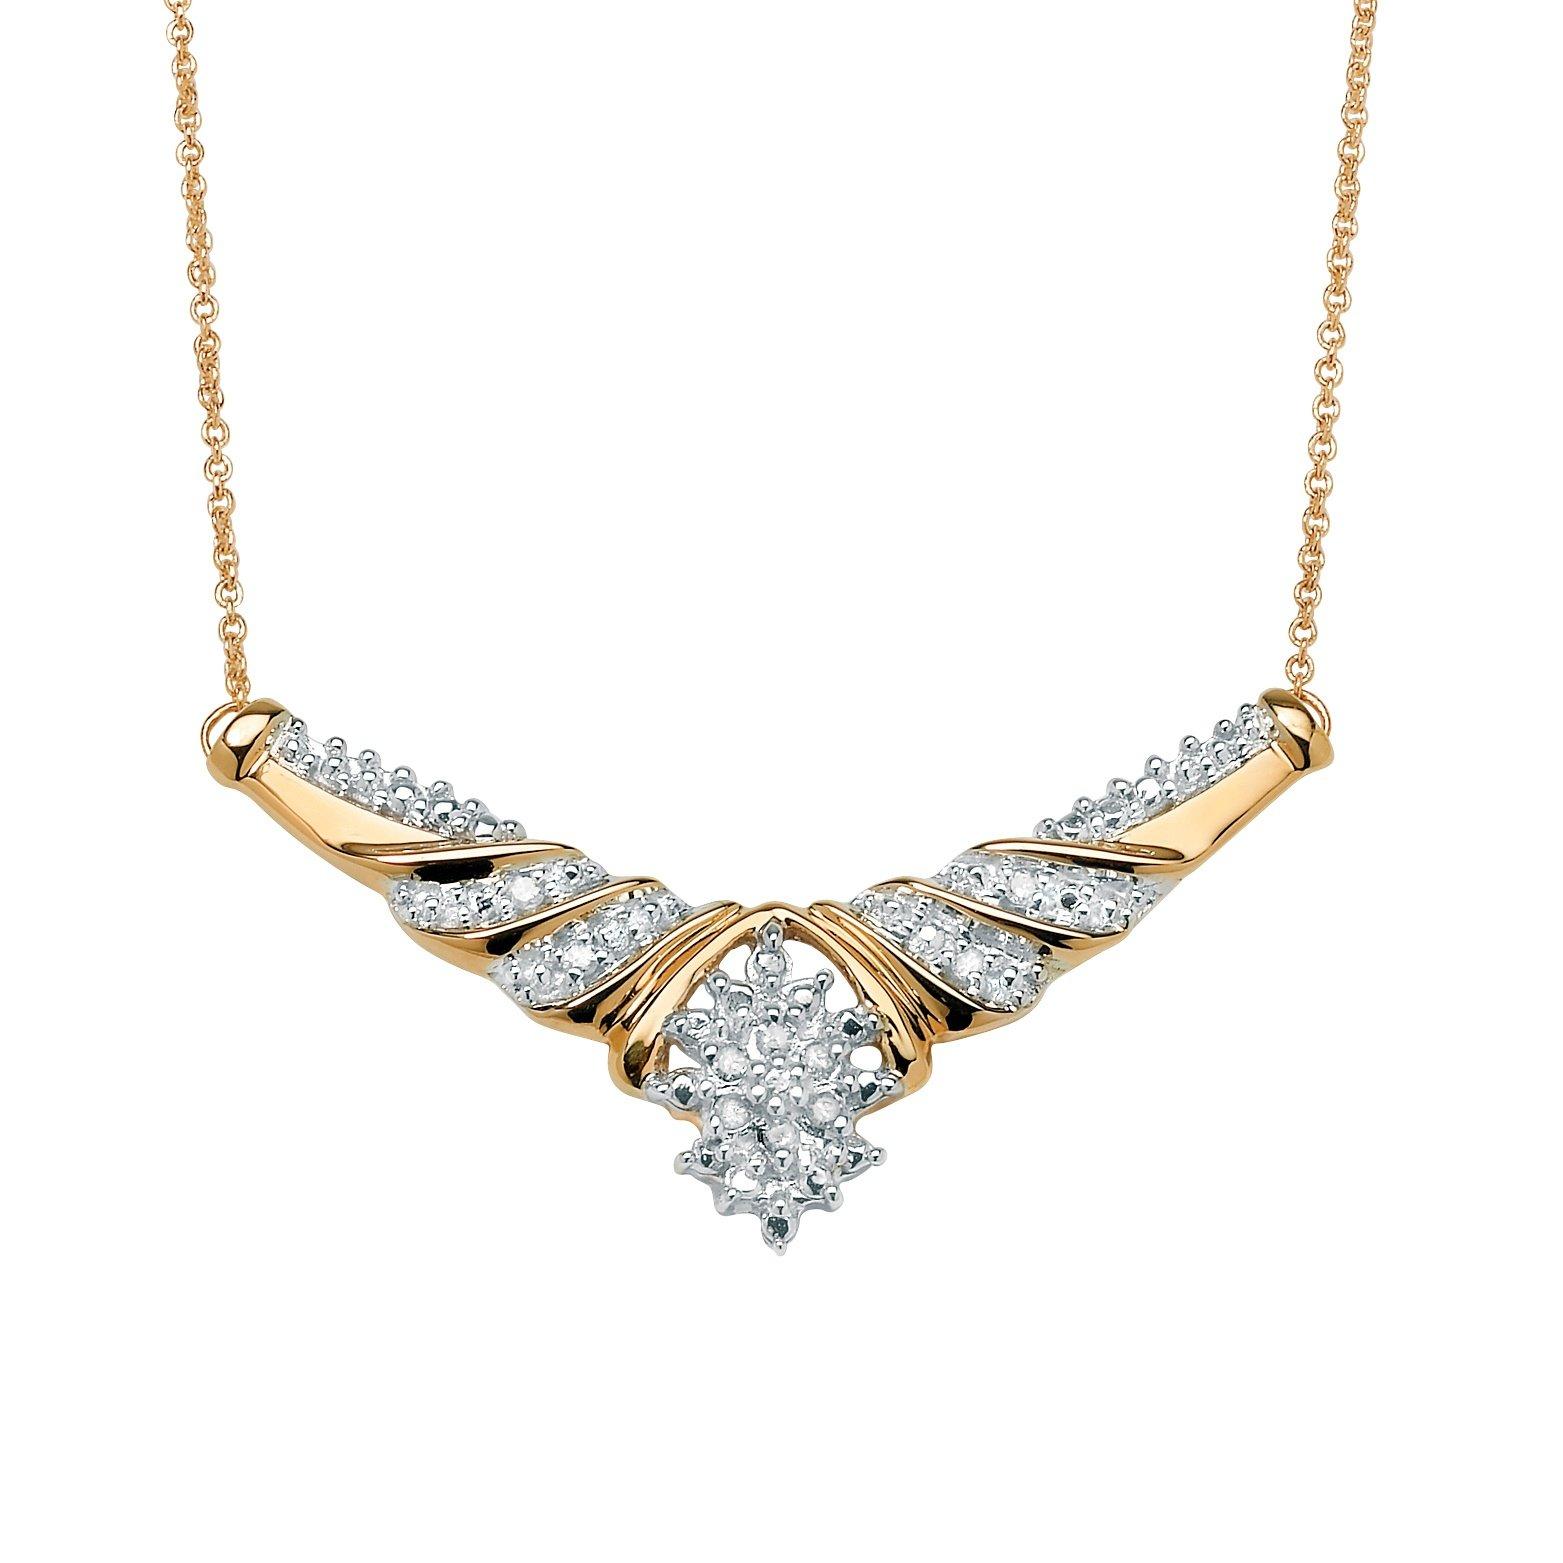 White Diamond 10k Gold Cluster Chevron Necklace (.10 cttw, HI Color, I3 Clarity) 16''